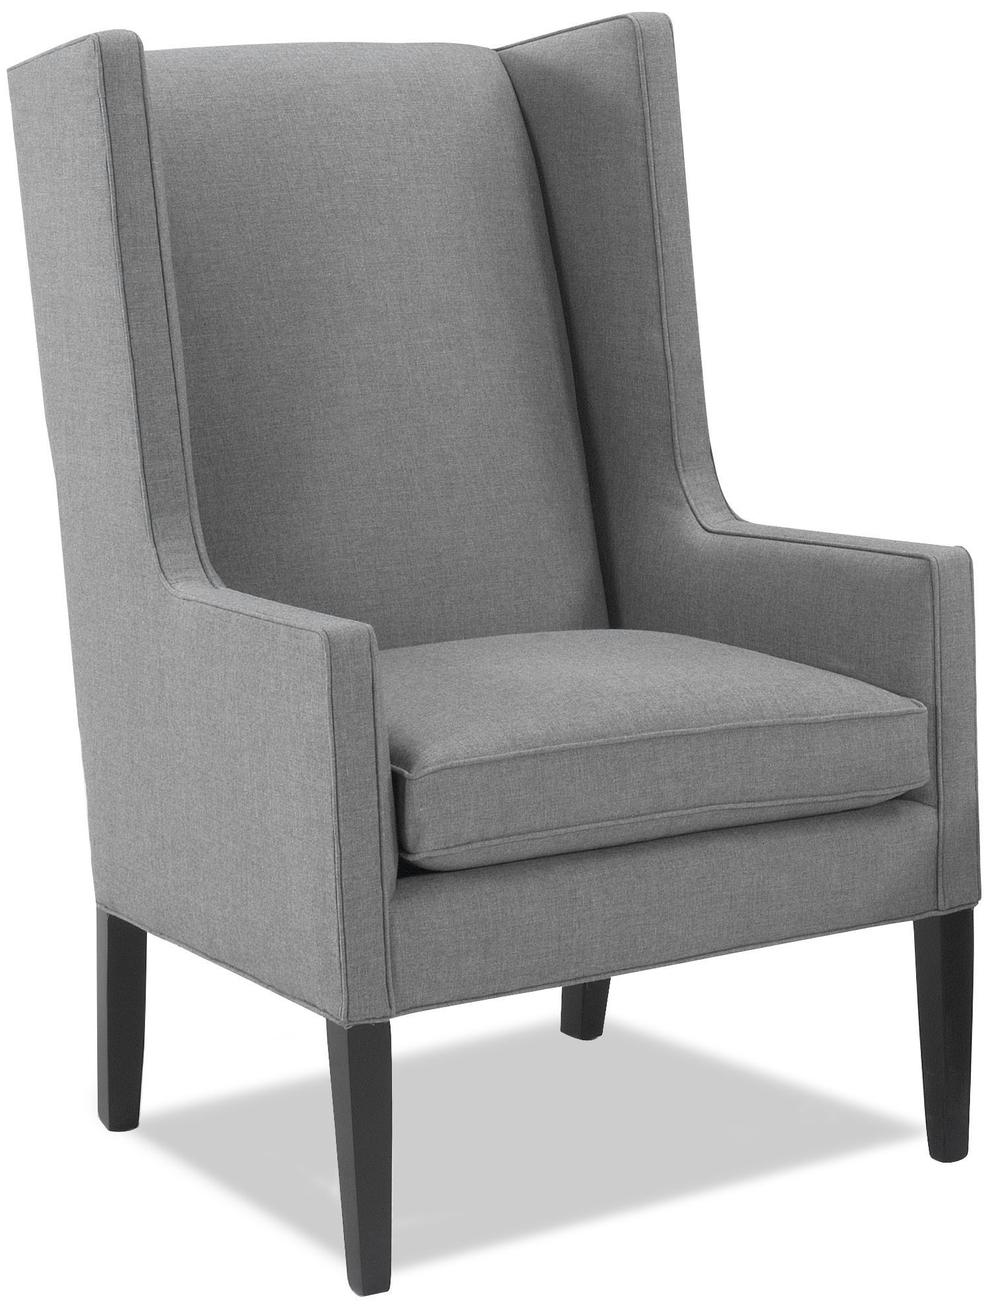 Temple Furniture - Arabella Chair